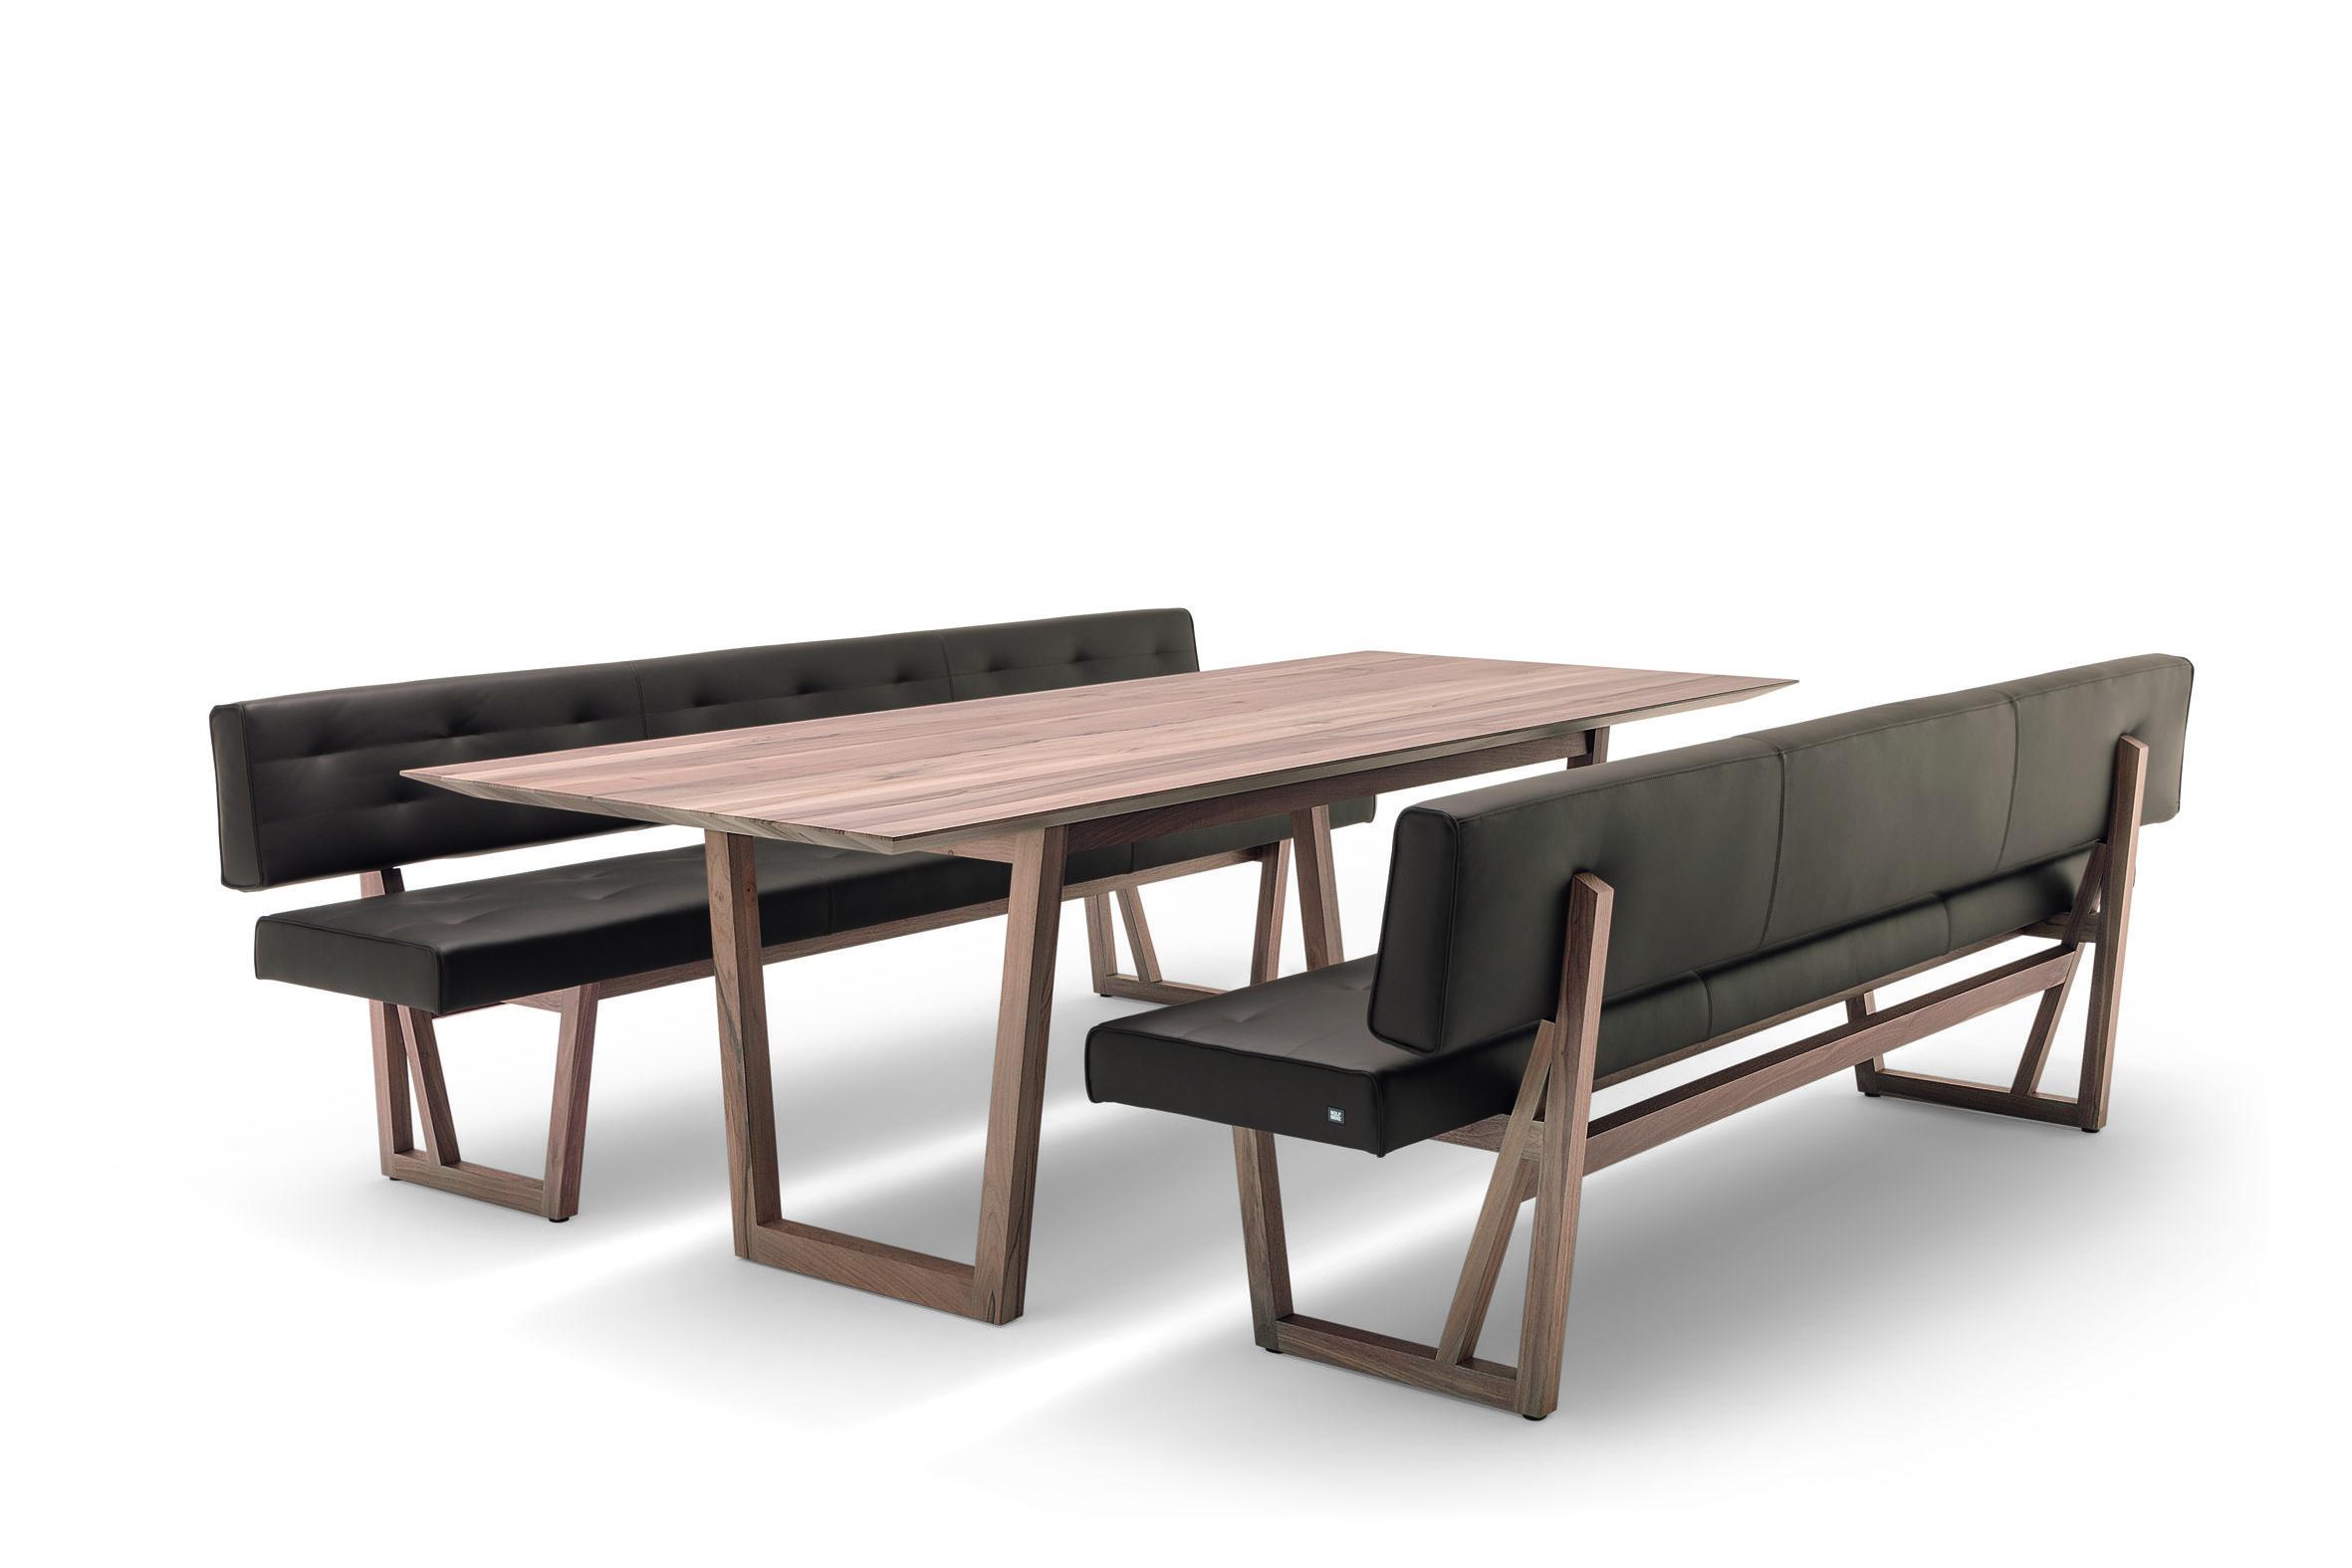 Rolf Benz Design Bank.Bank Rolf Benz 624 En Tafel Rolf Benz 924 Furniture Bench